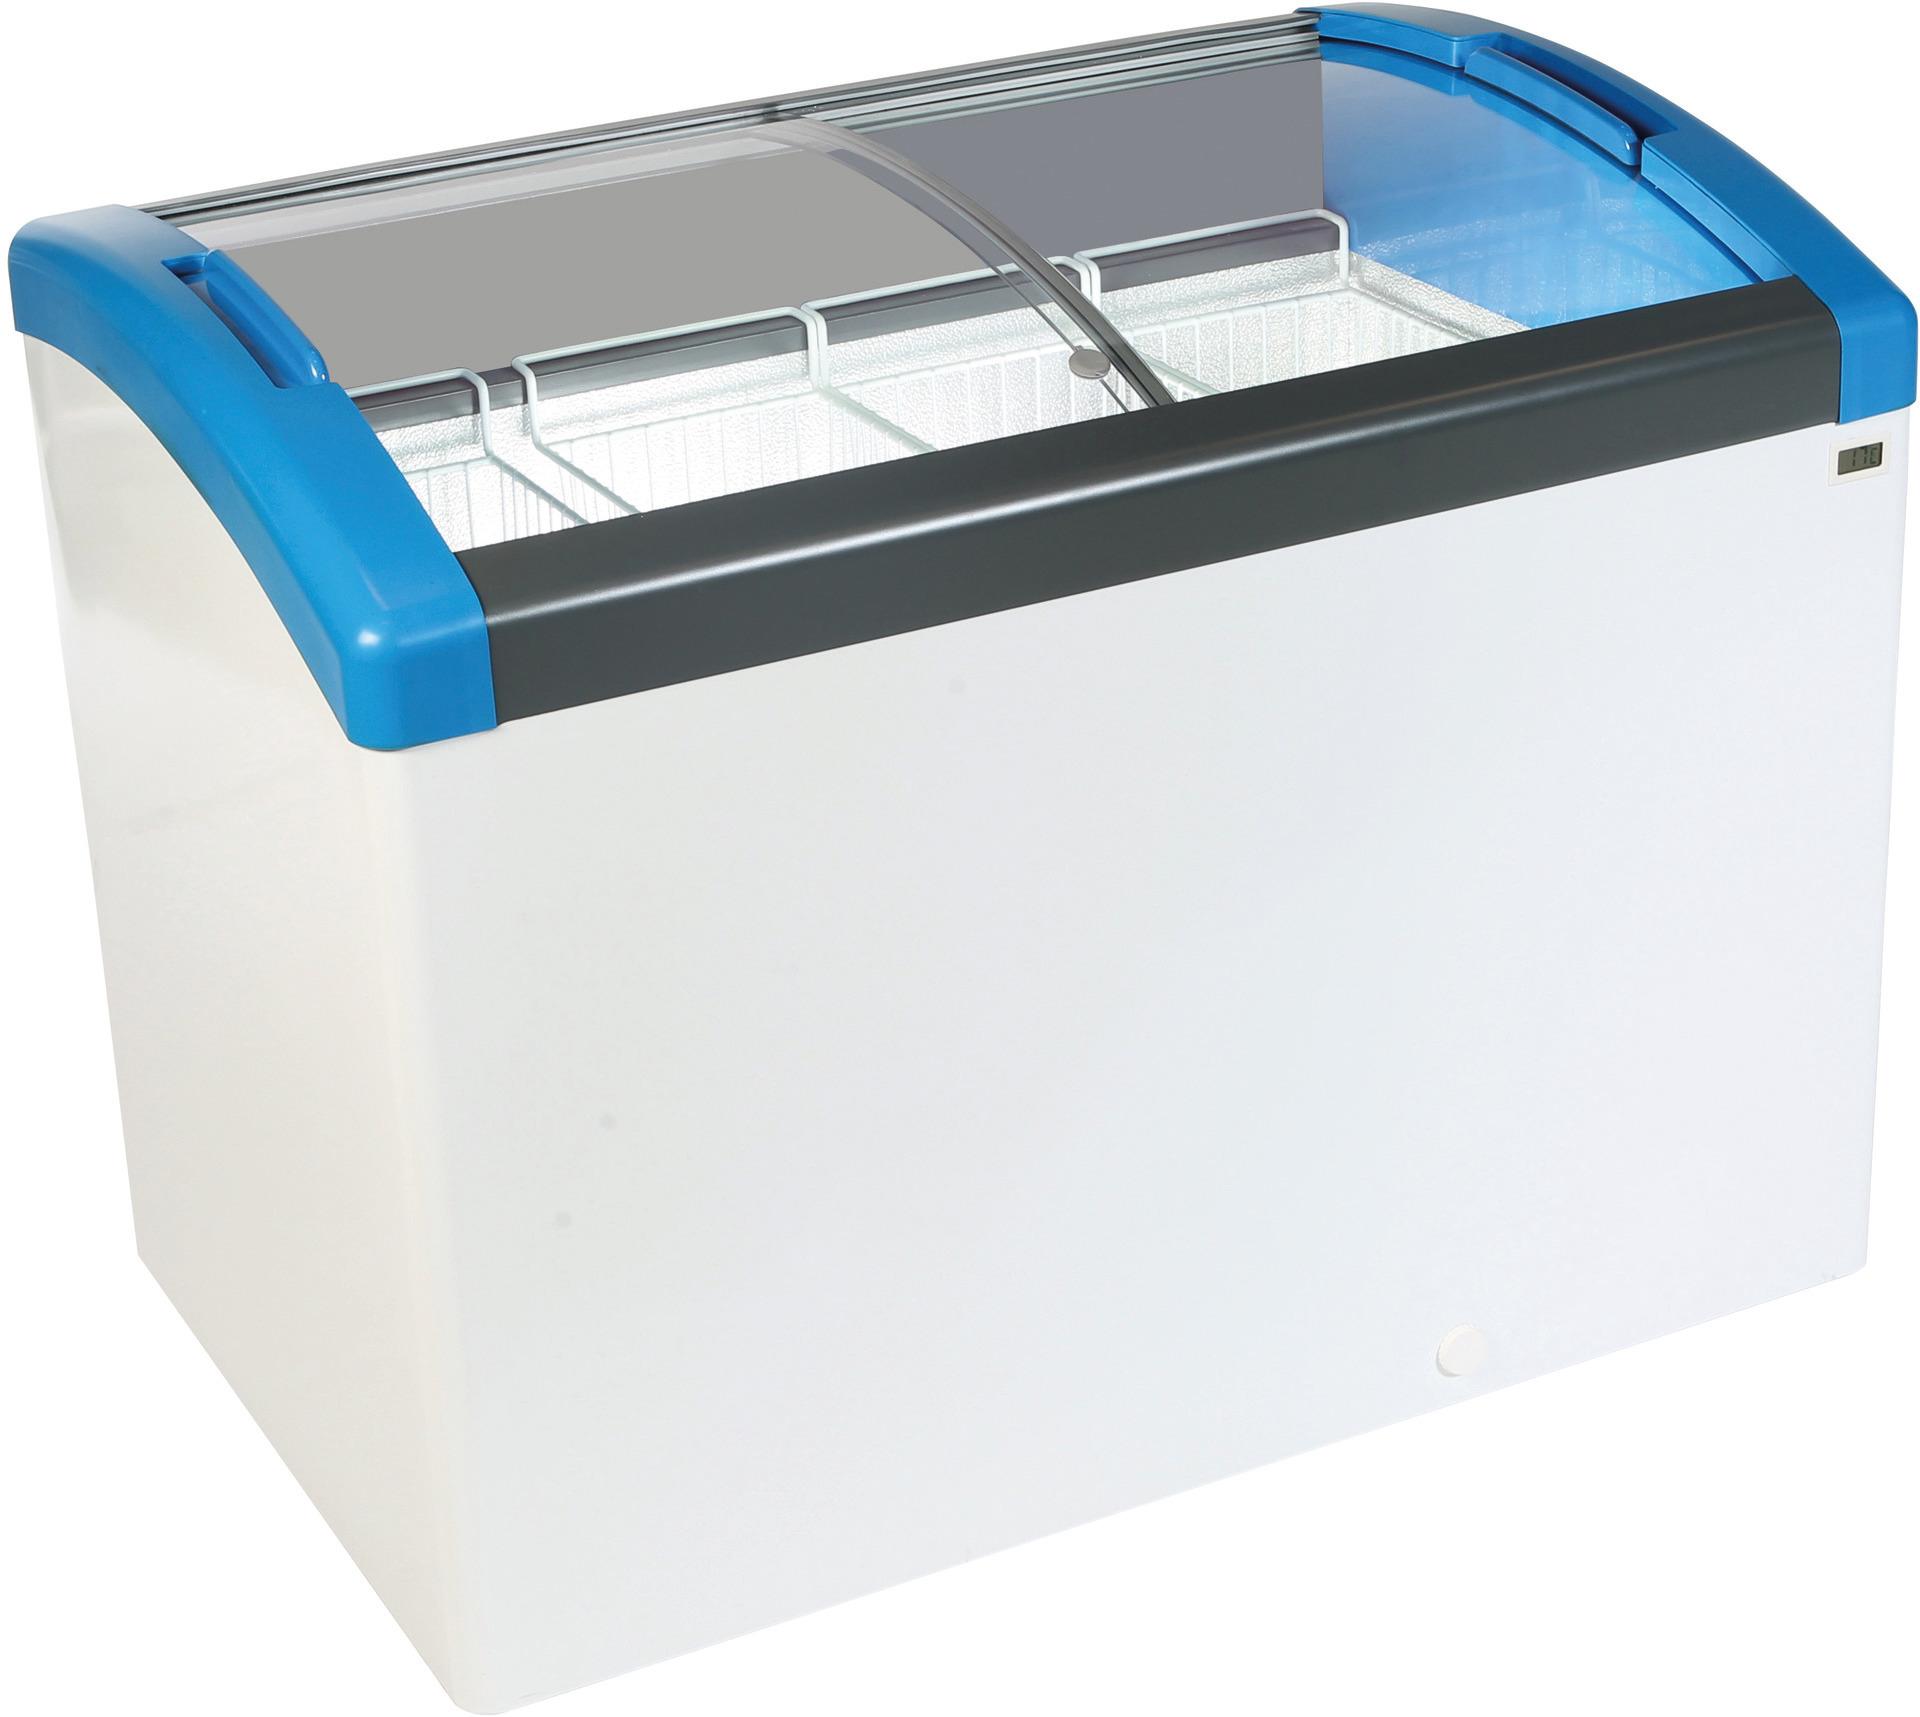 Kühl- / Tiefkühl-Impulstruhe 270,00 l  / für 4 Körbe / steckerfertig